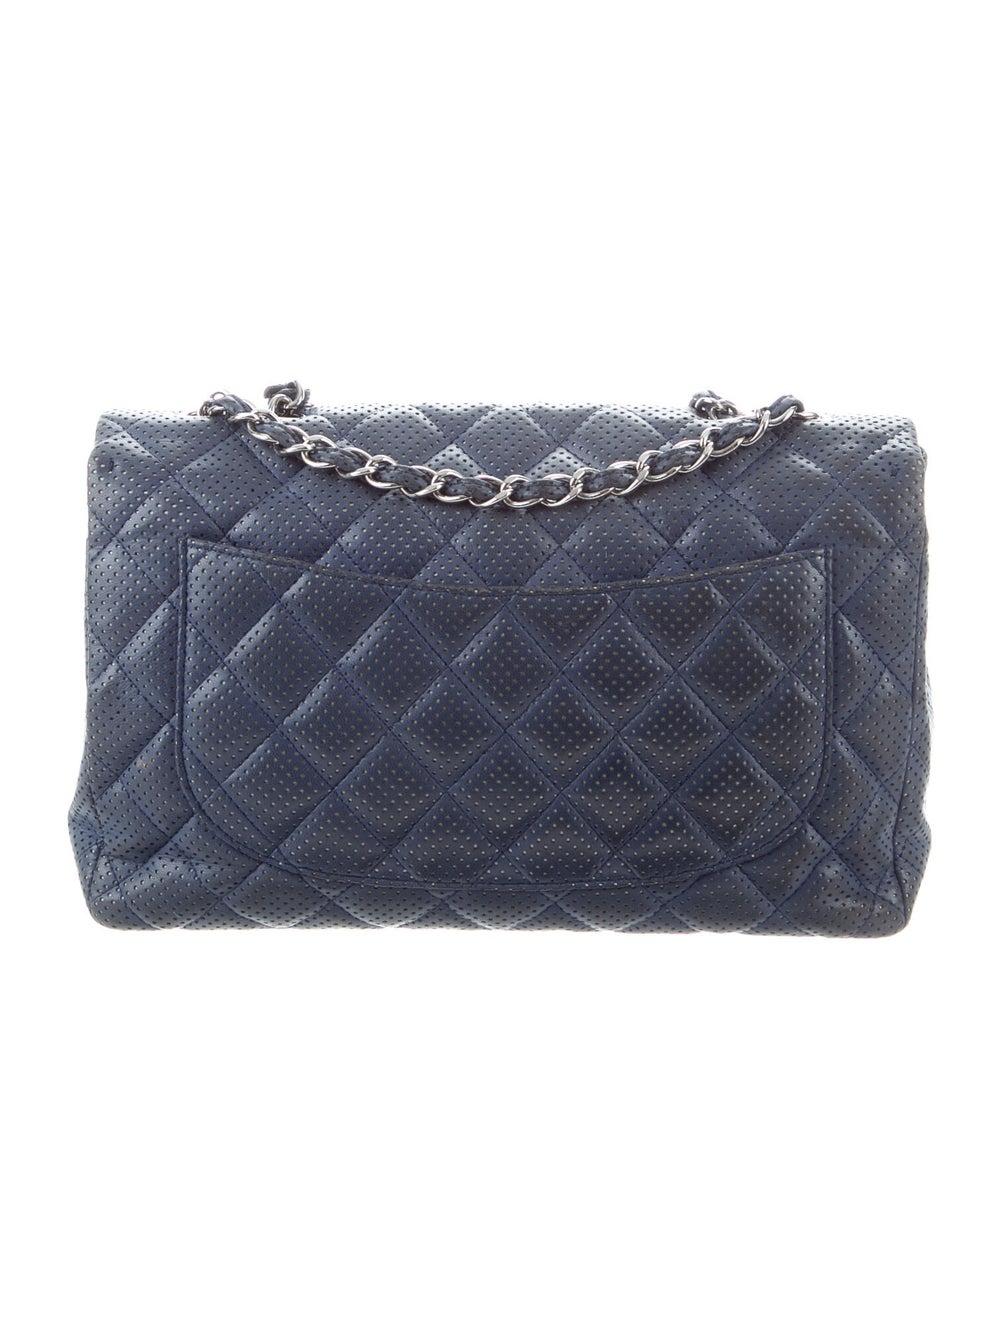 Chanel Classic Jumbo Single Flap Bag Blue - image 4